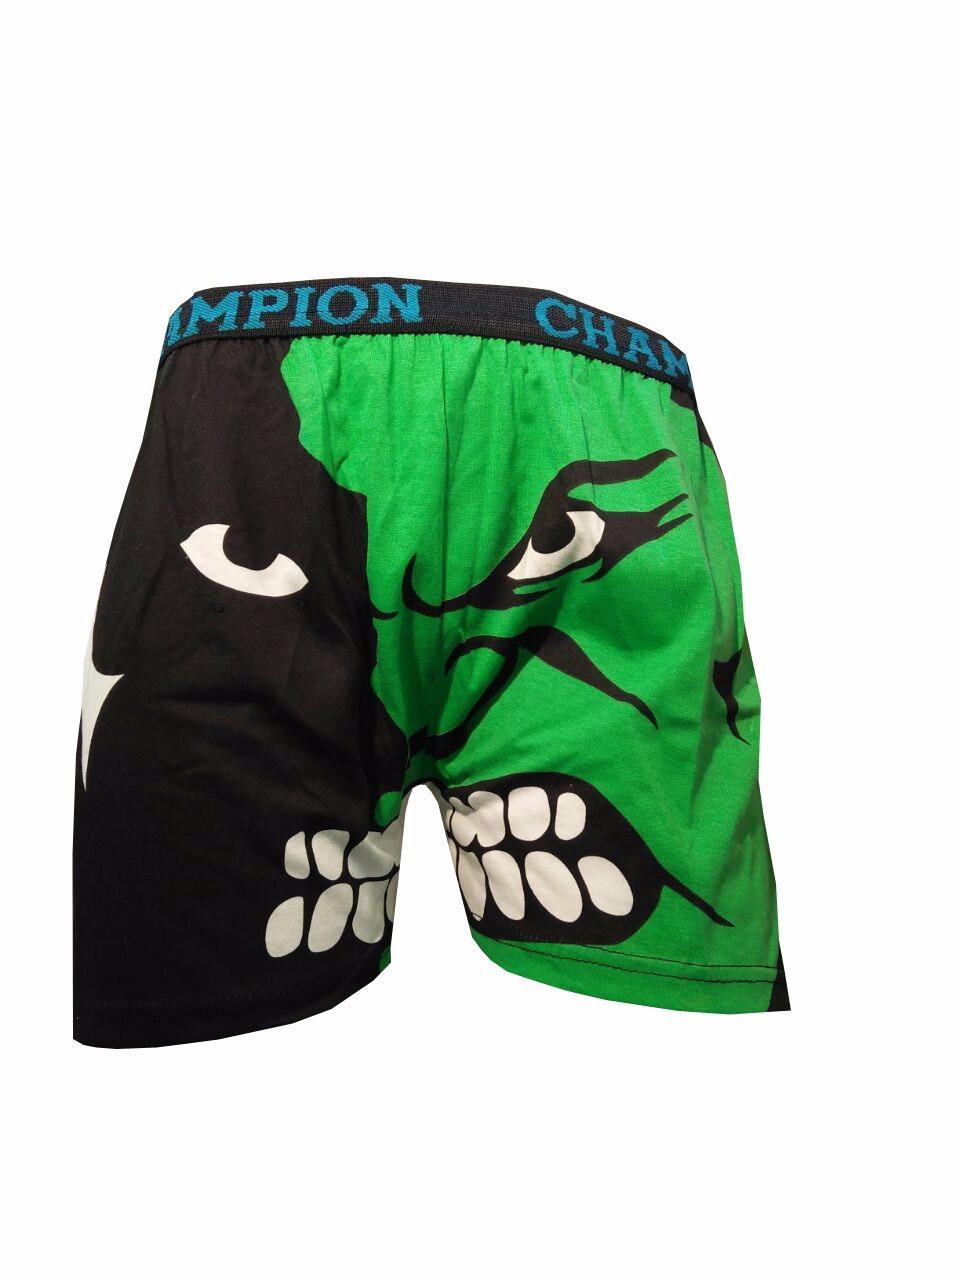 Boxer Celana Branded Dalam Pria Motif Kartun pria/Wanita Cotton Lucu Allsize 3pcs